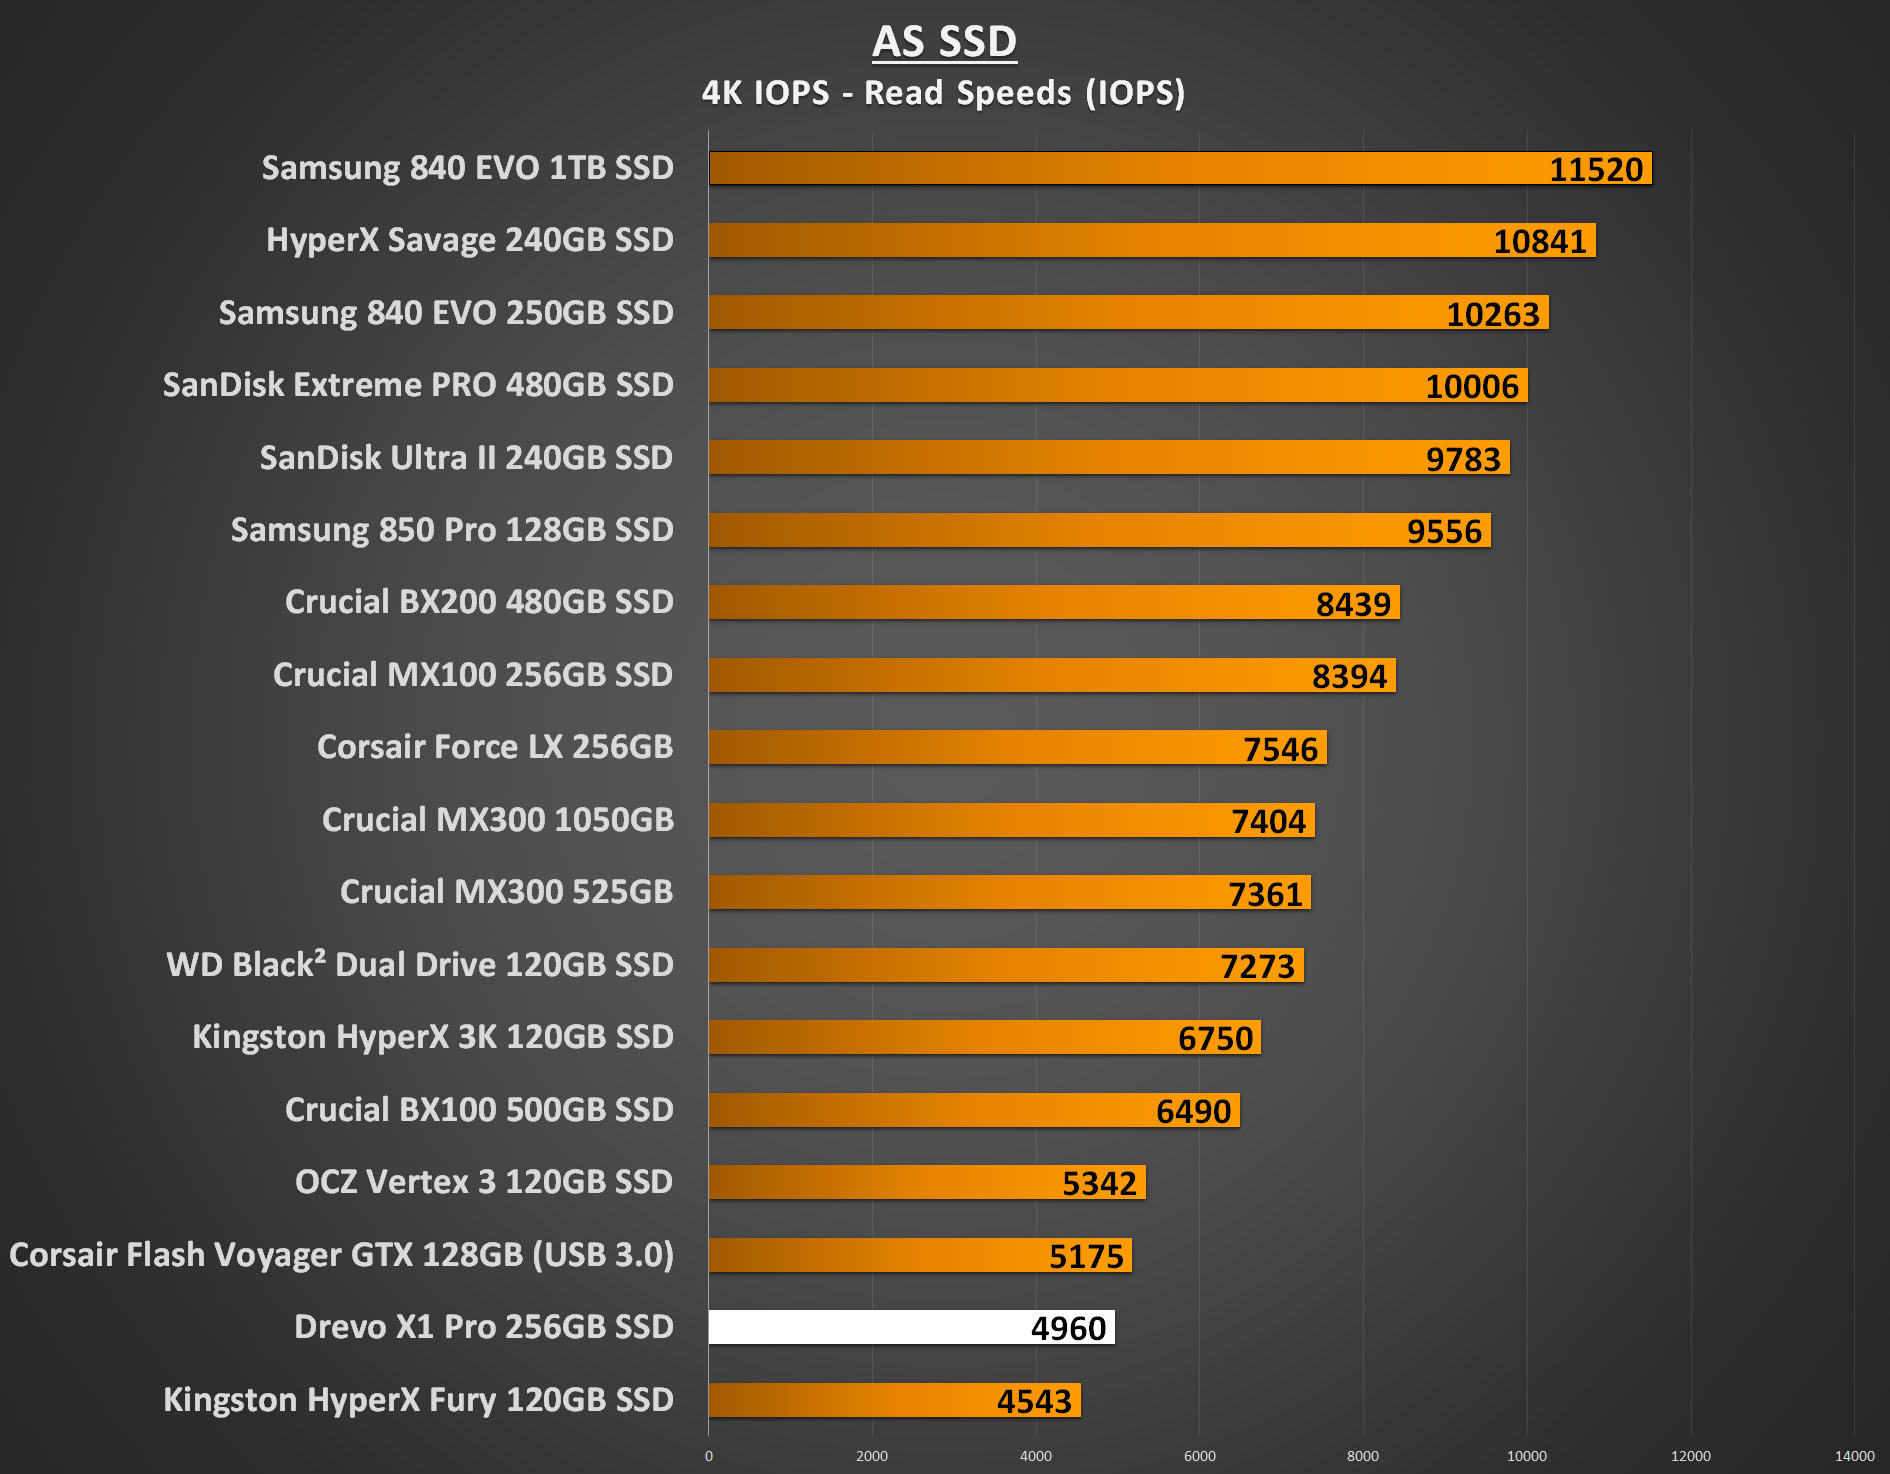 Drevo X1 Pro 256GB Performance - AS SSD 4K IOPS